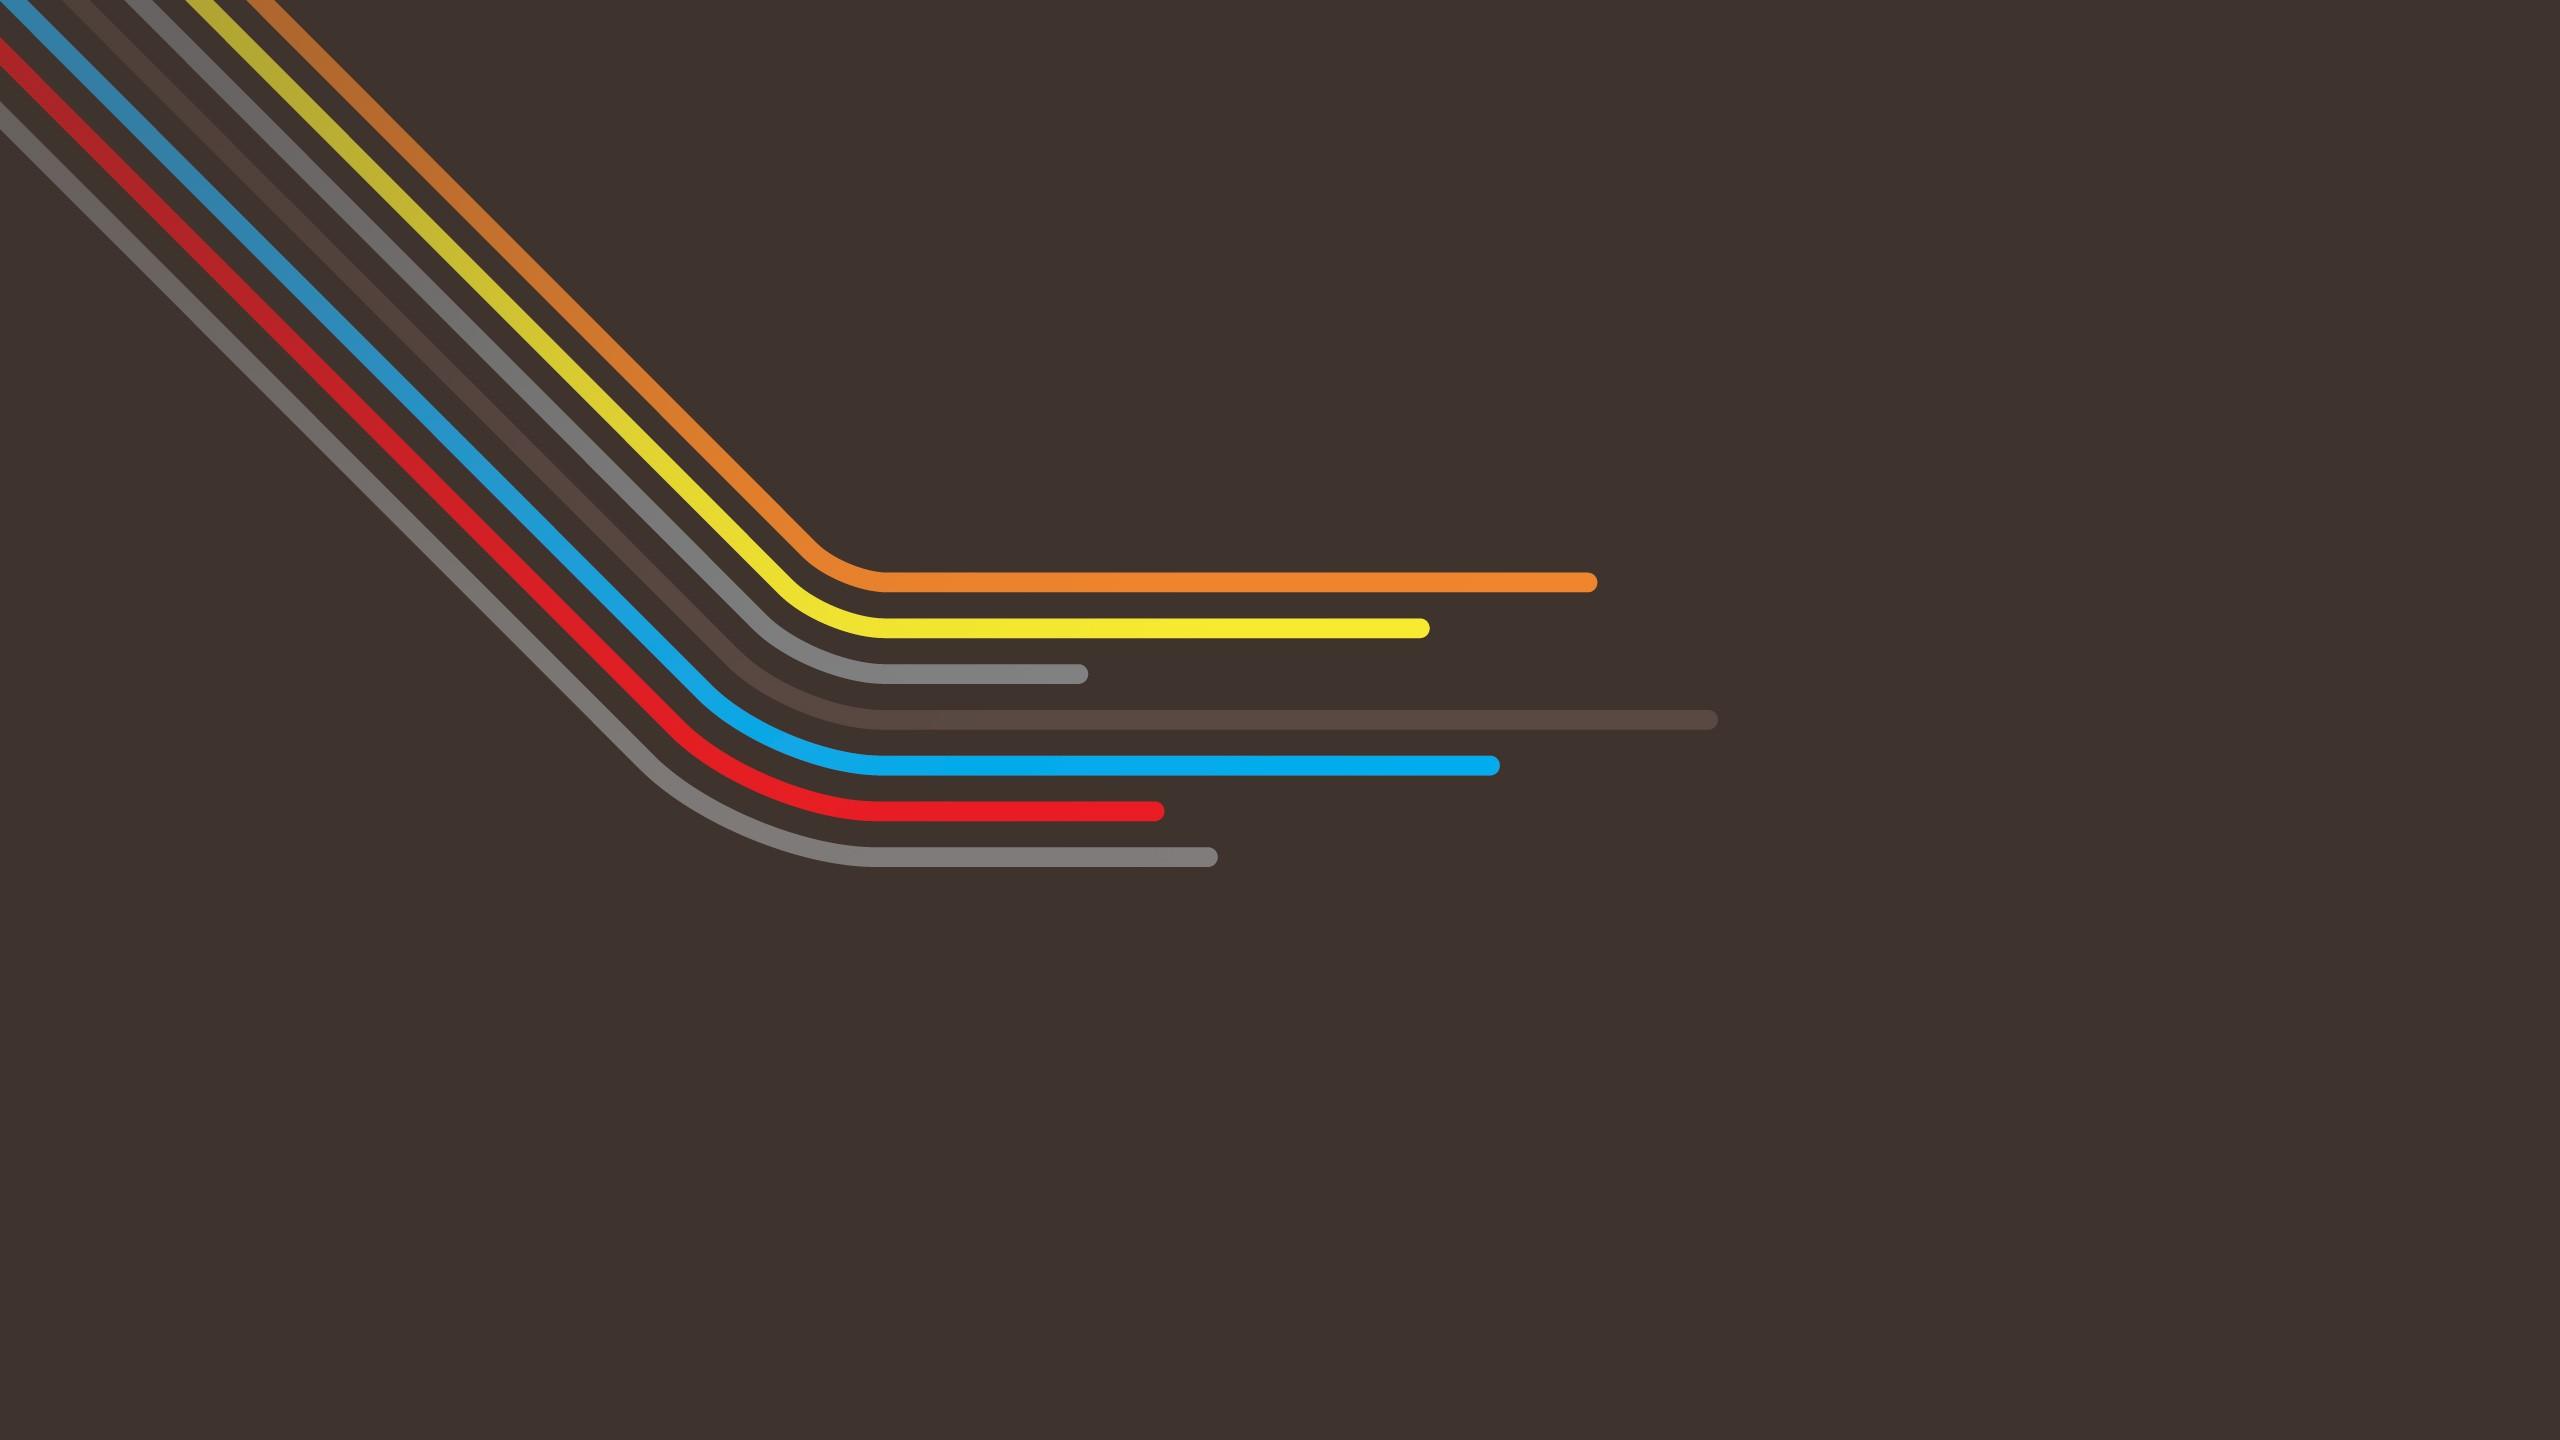 Minimalistic multicolor vector wallpaper | 2560x1440 ...